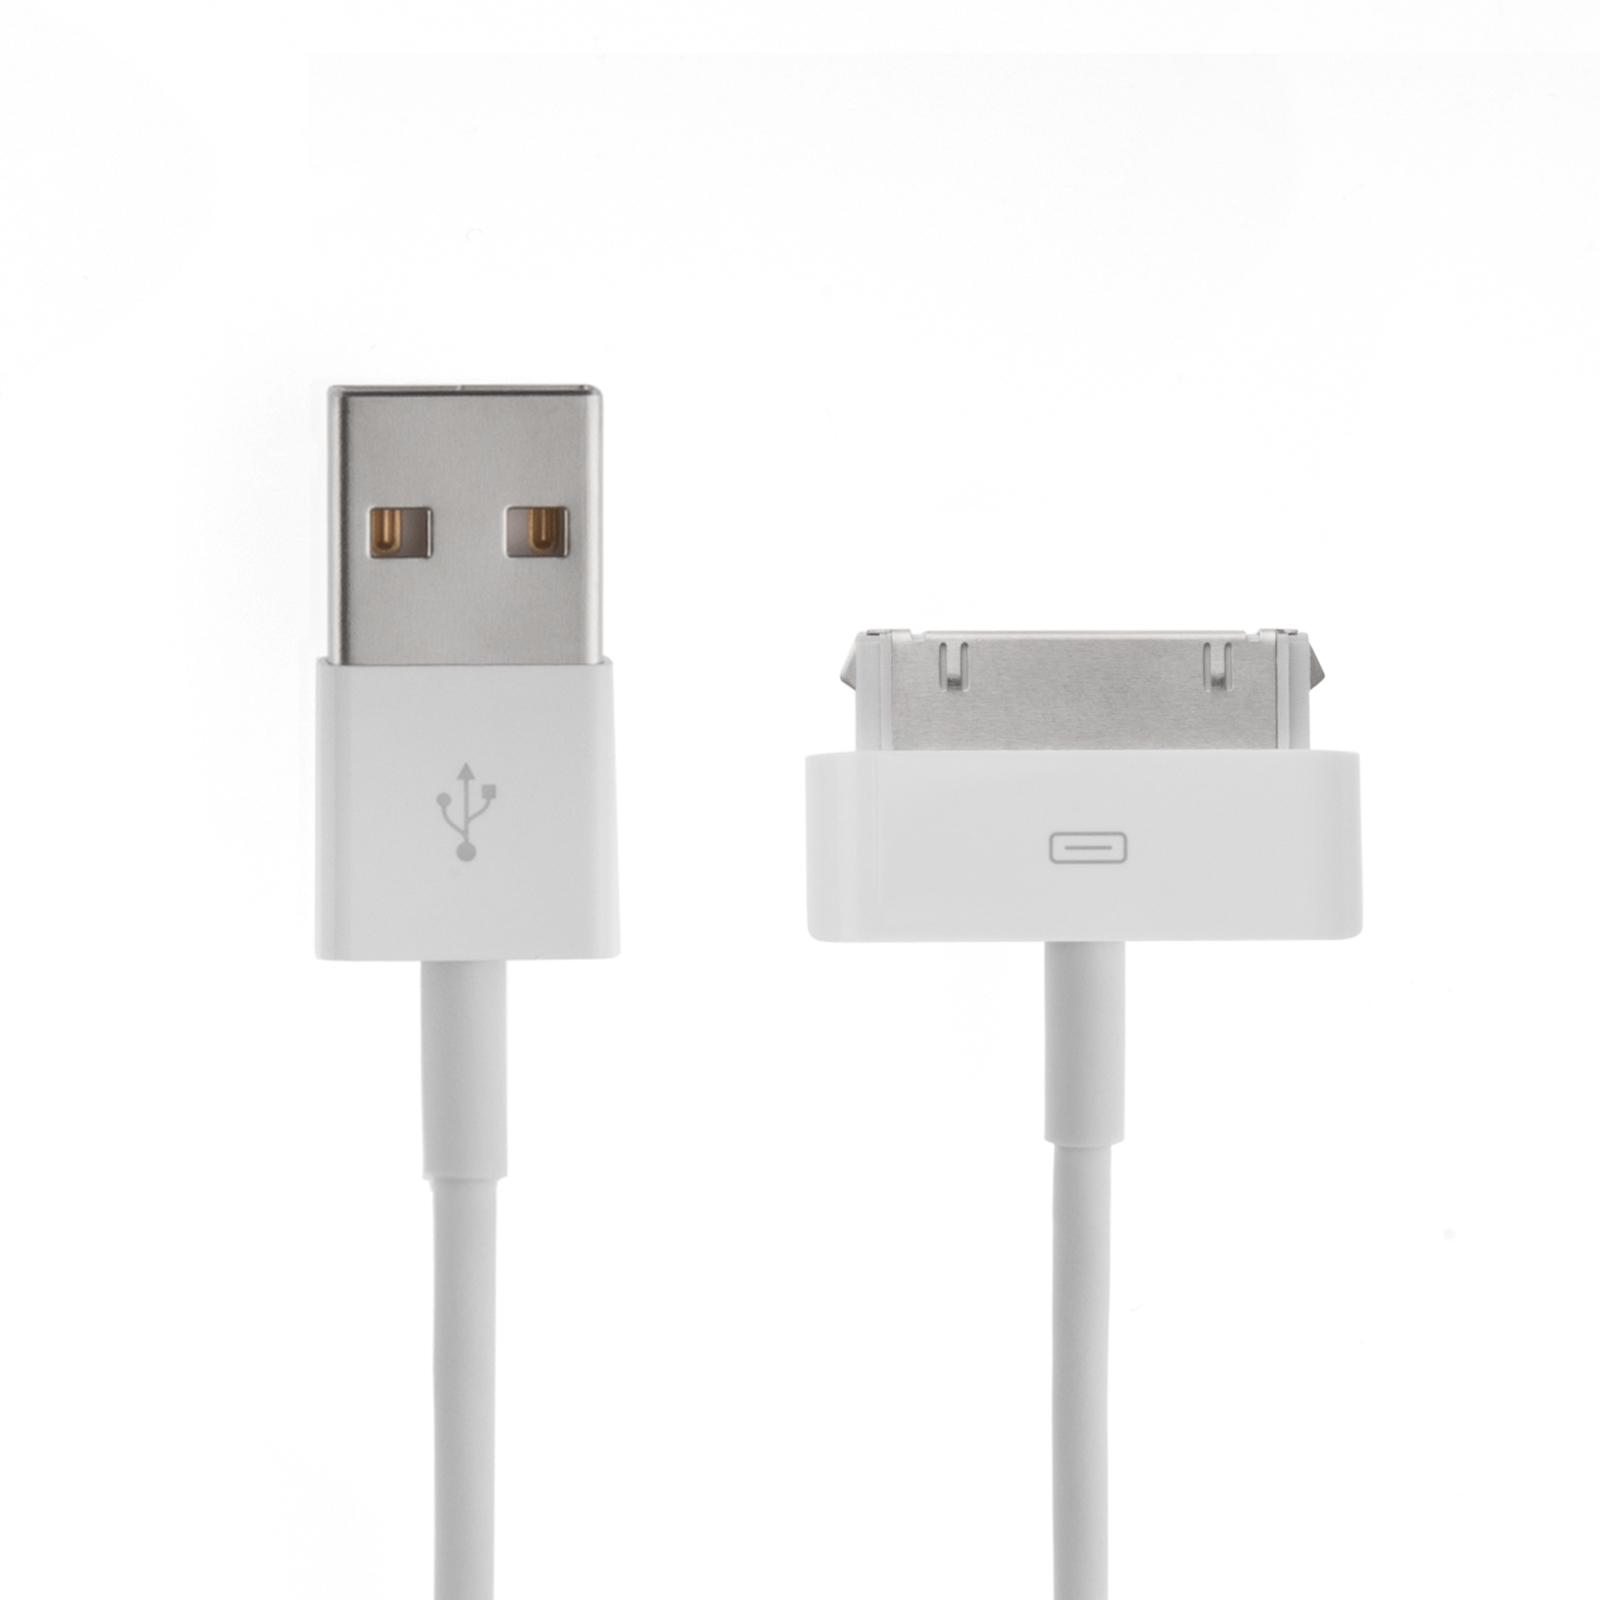 Apple 30 Pin to USB